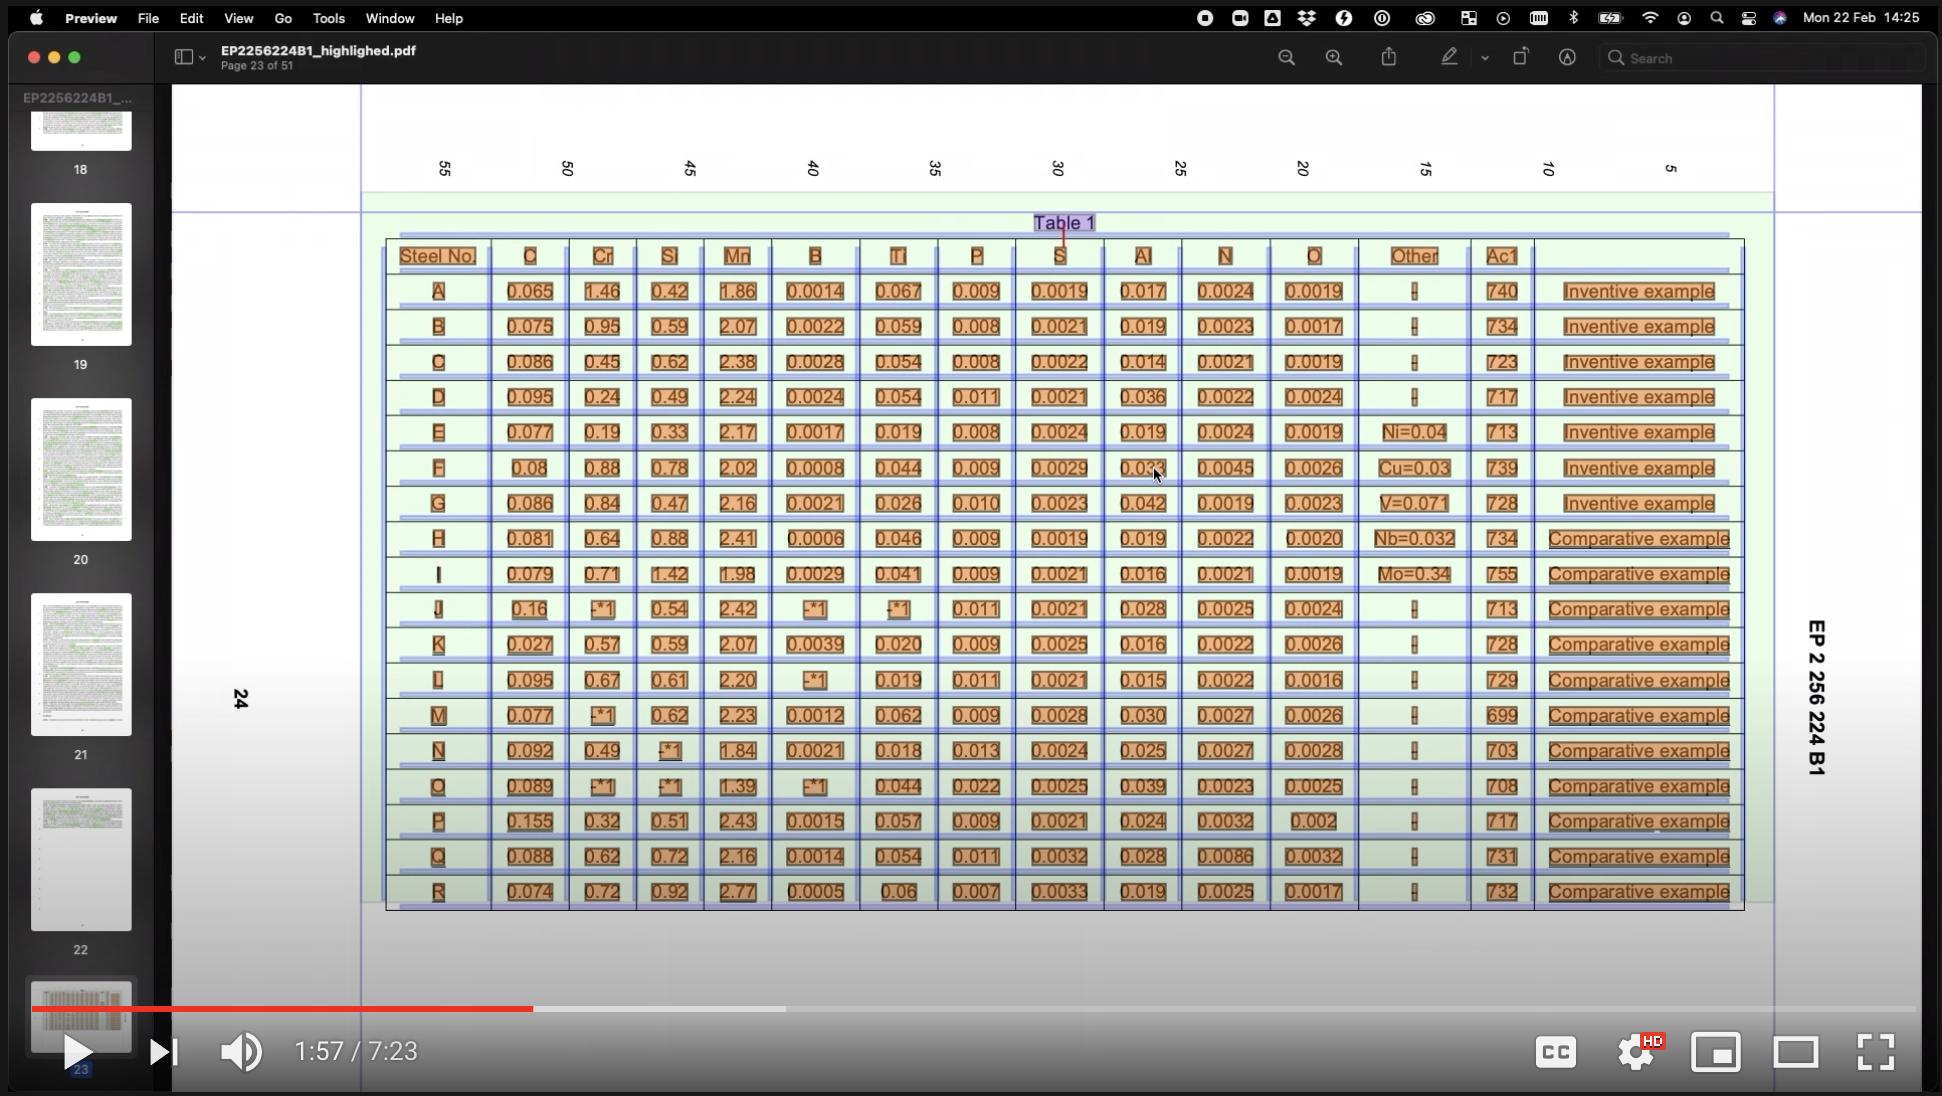 Extract tool Webinar